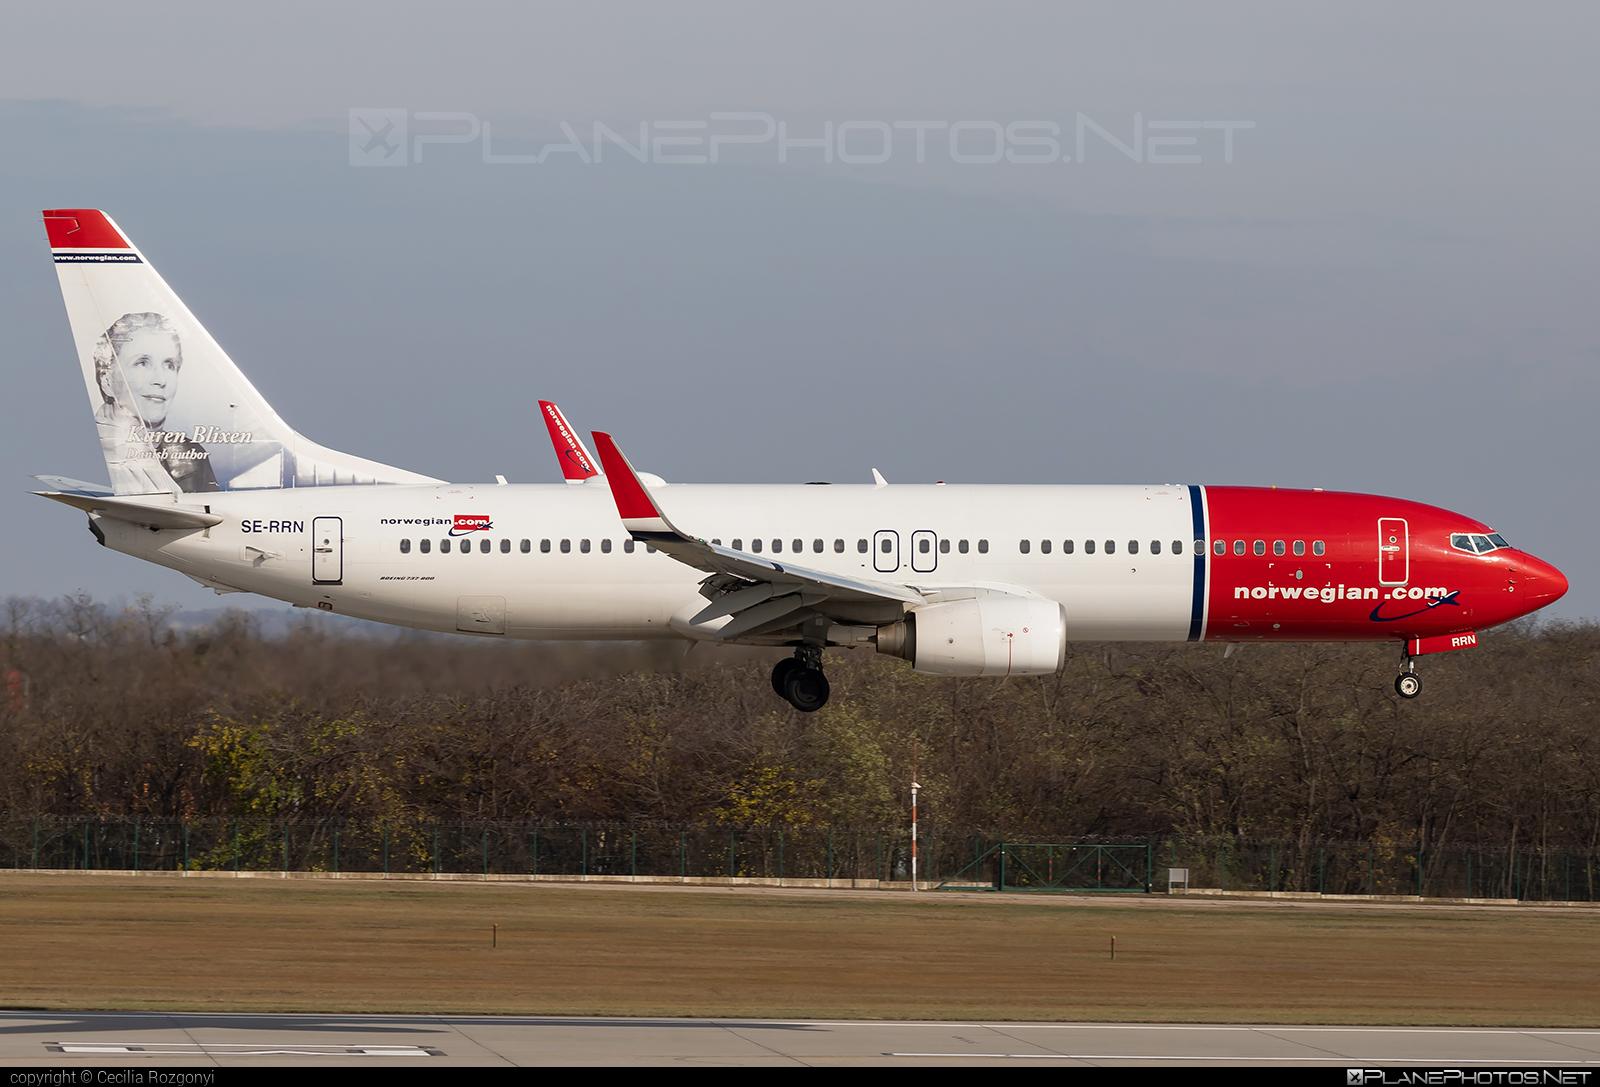 Boeing 737-800 - SE-RRN operated by Norwegian Air Sweden #b737 #b737nextgen #b737ng #boeing #boeing737 #norwegian #norwegianair #norwegianairsweden